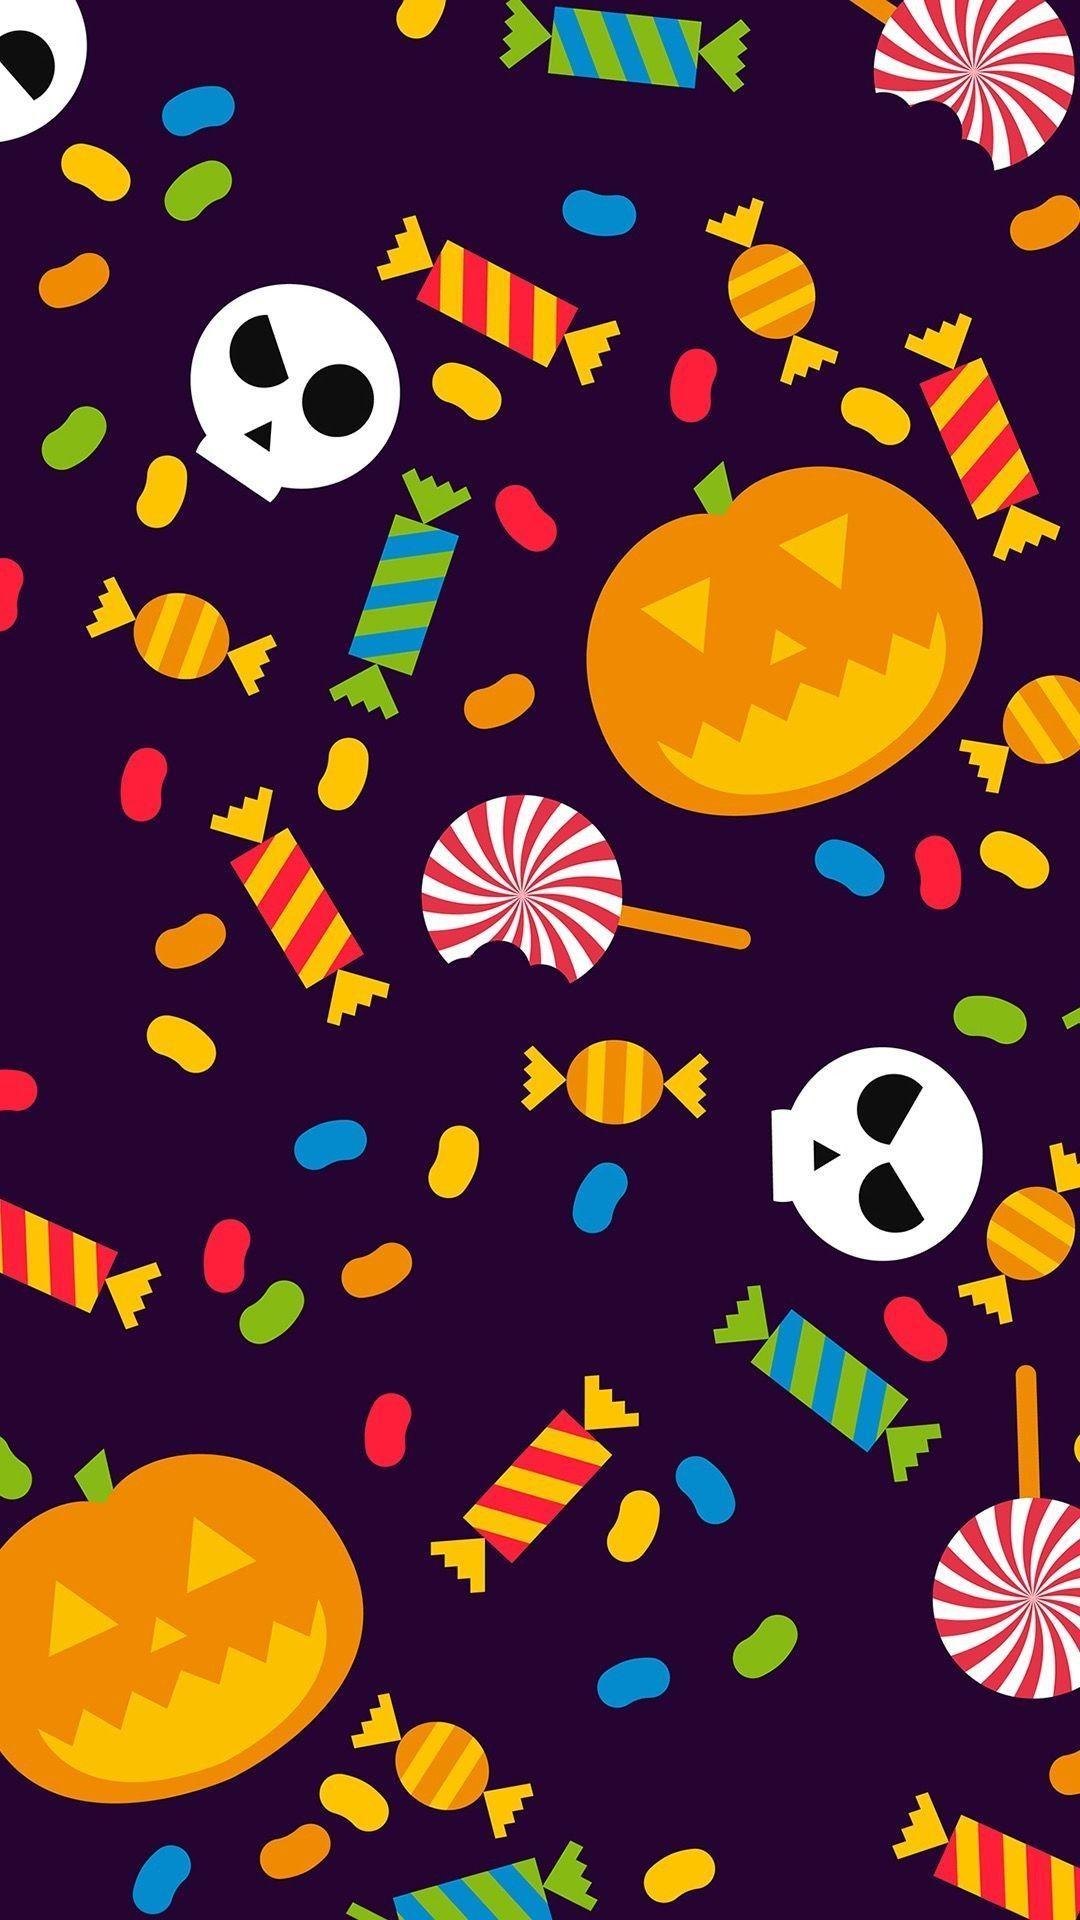 Cute Halloween Iphone Wallpapers Top Free Cute Halloween Iphone Backgrounds Wallpaperaccess